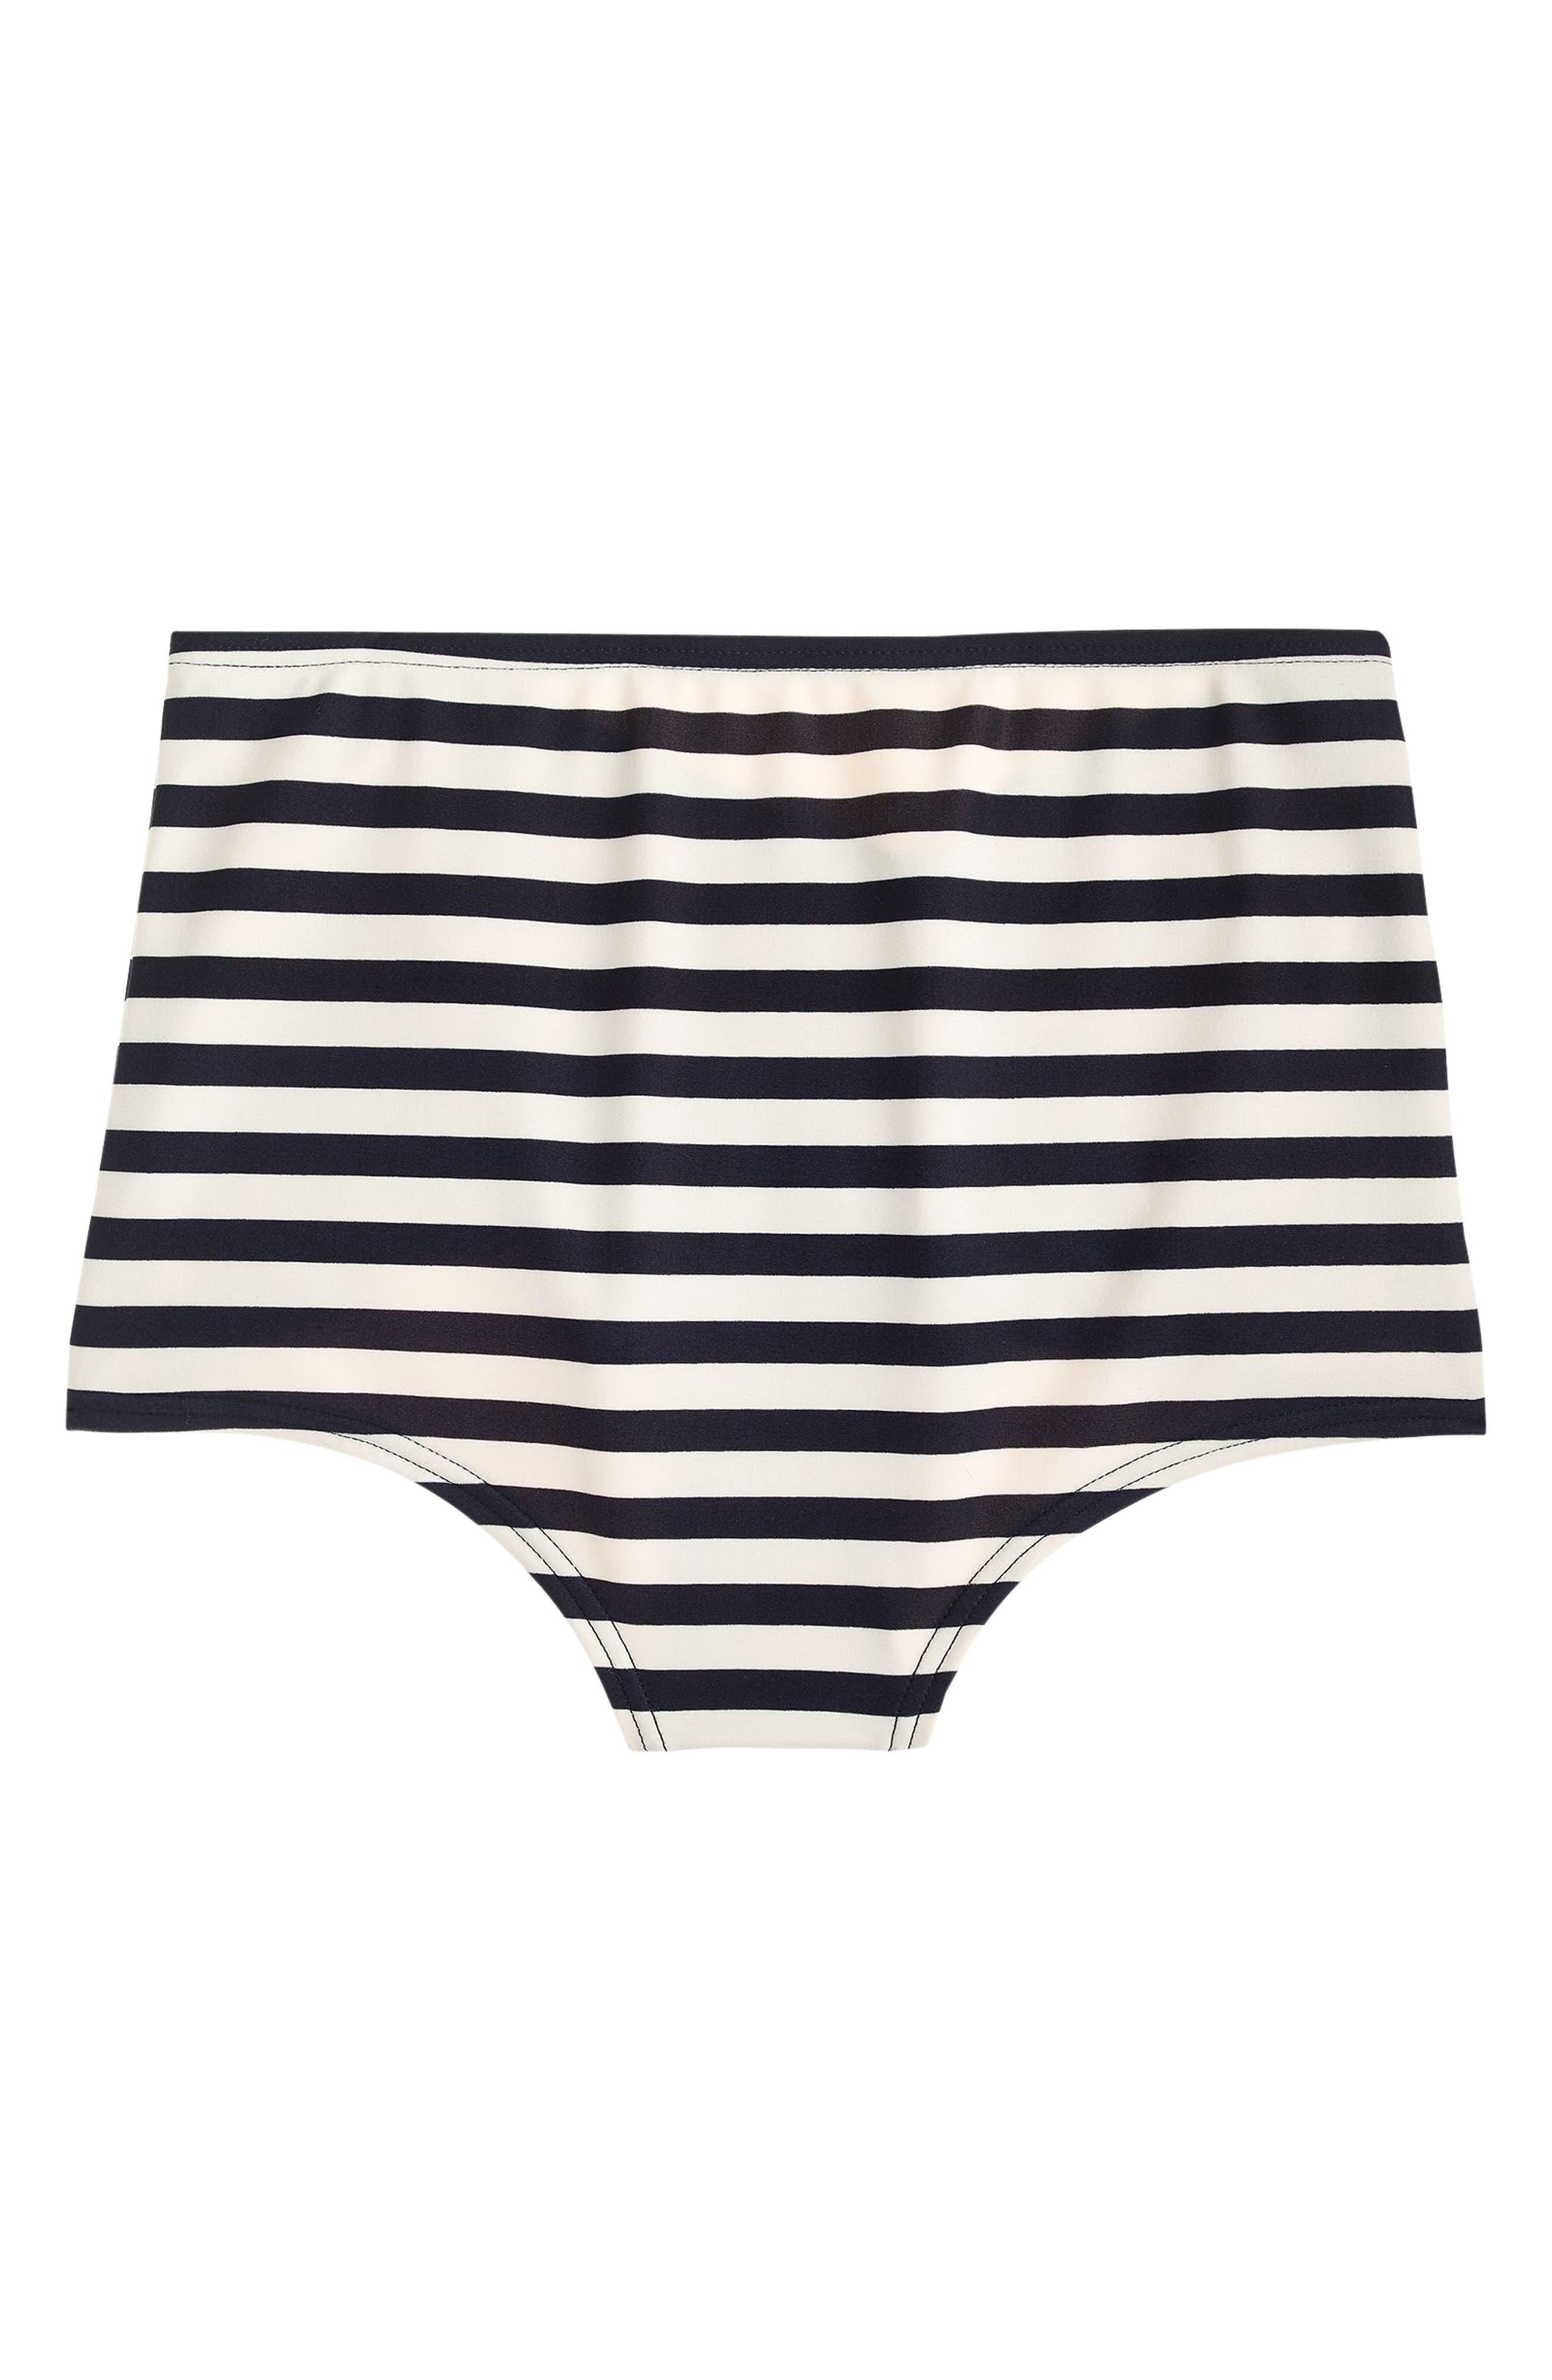 Stripe High Waist Bikini Bottoms,                             Alternate thumbnail 3, color,                             NAVY IVORY